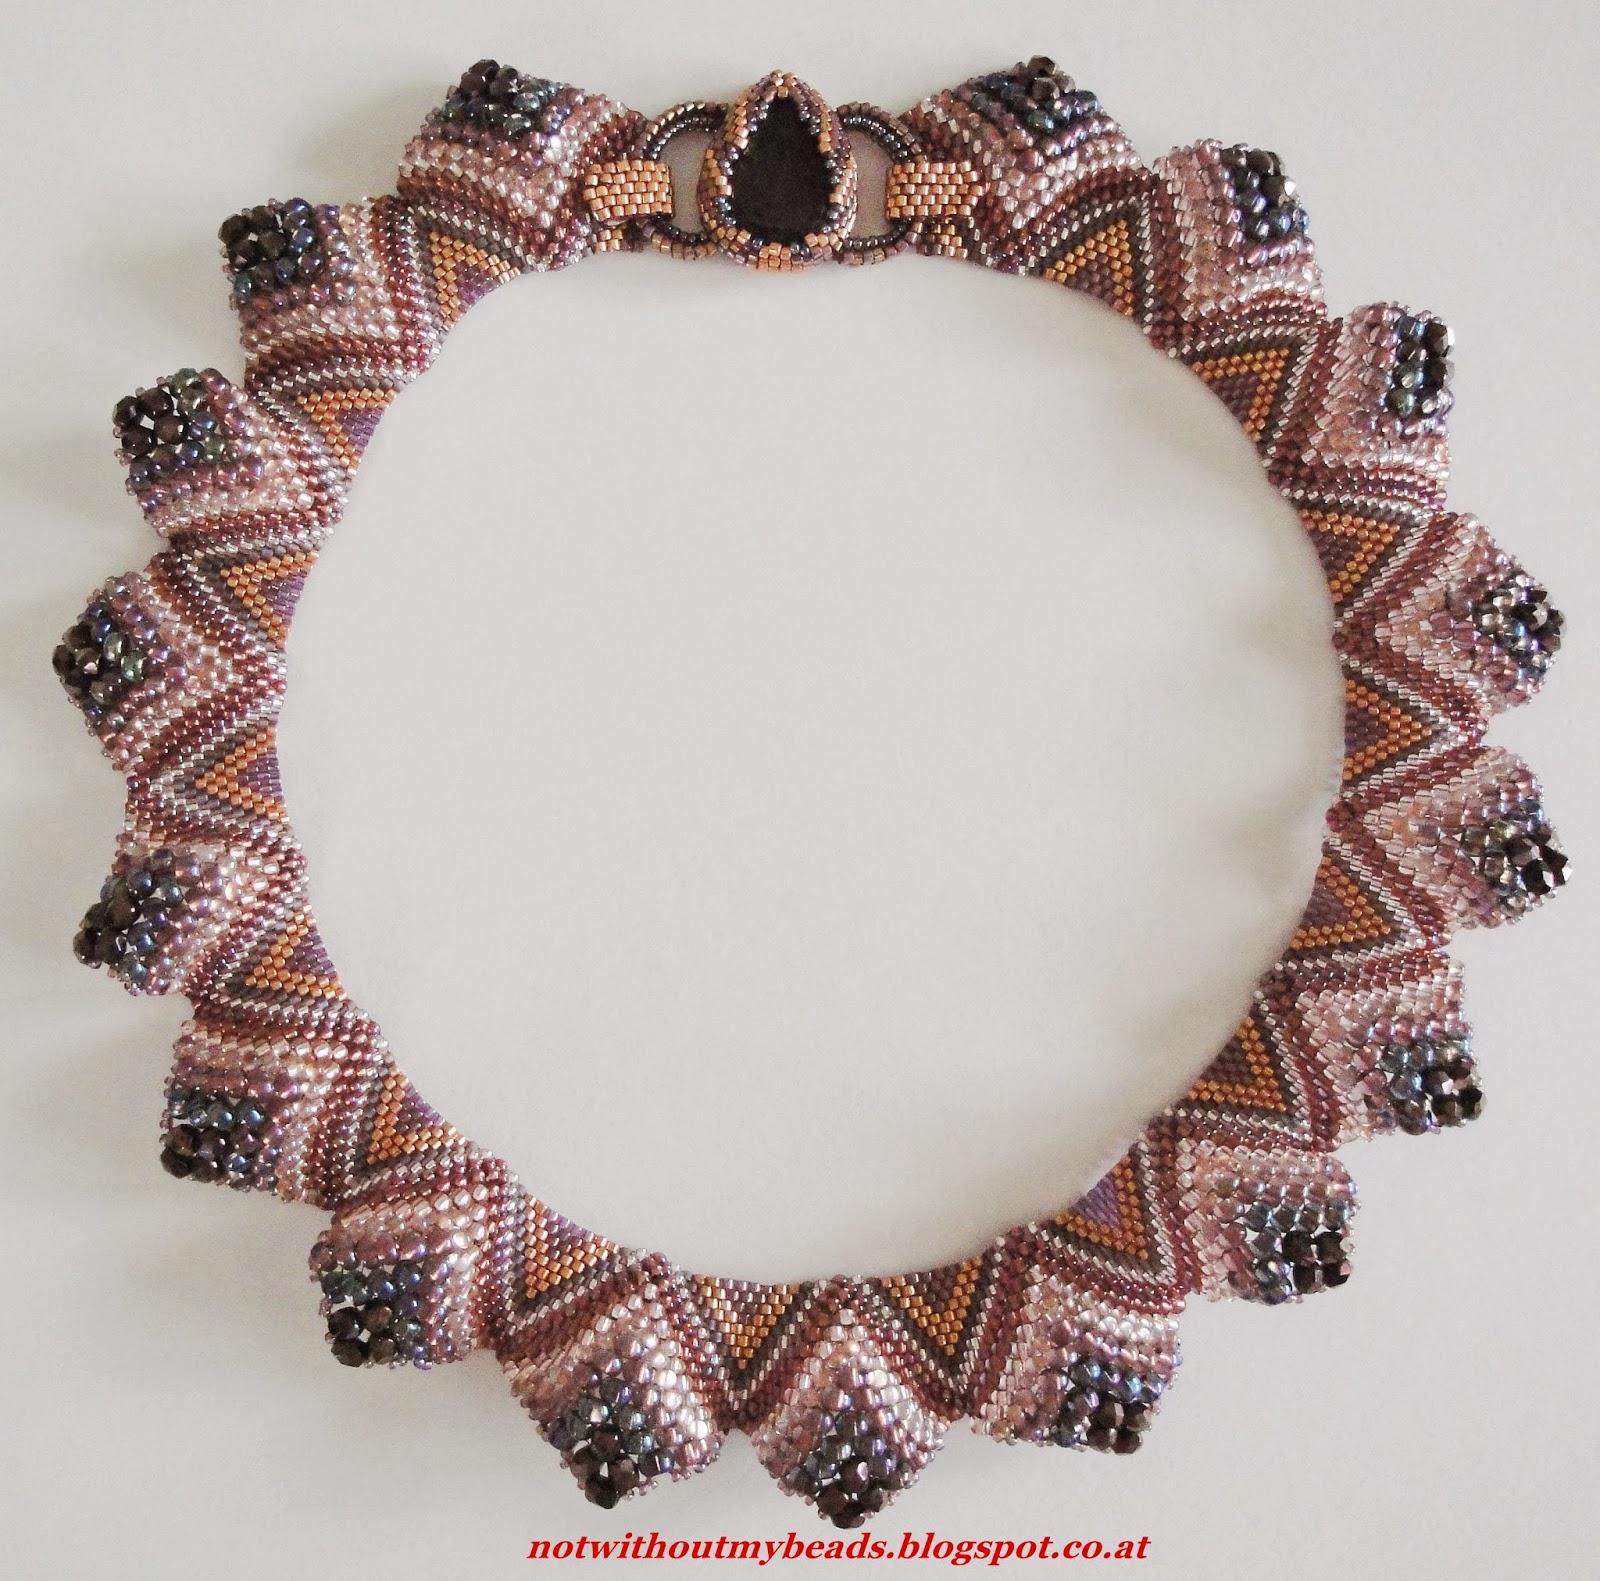 Stunning Sculptural Peyote Necklace Tutorial ~ The Beading Gem\'s Journal